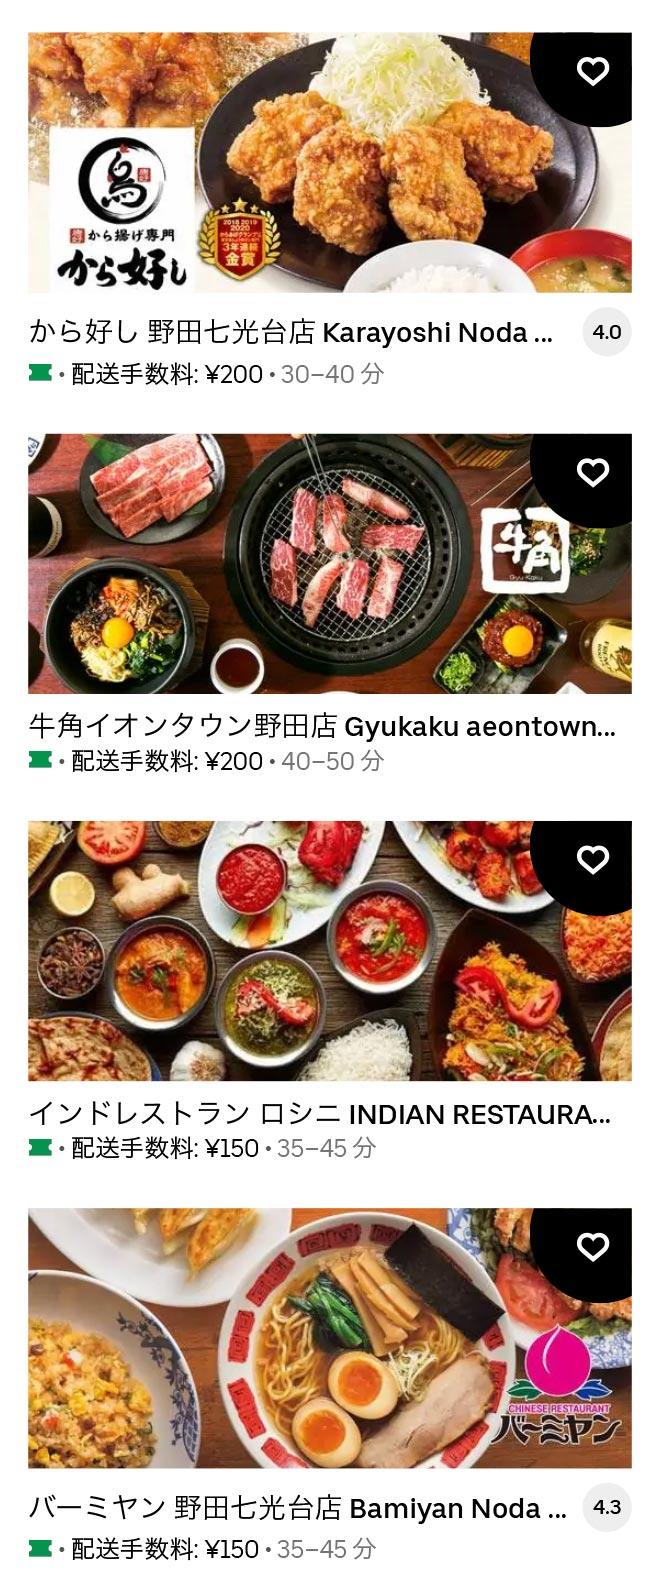 U kawama menu 2104 02